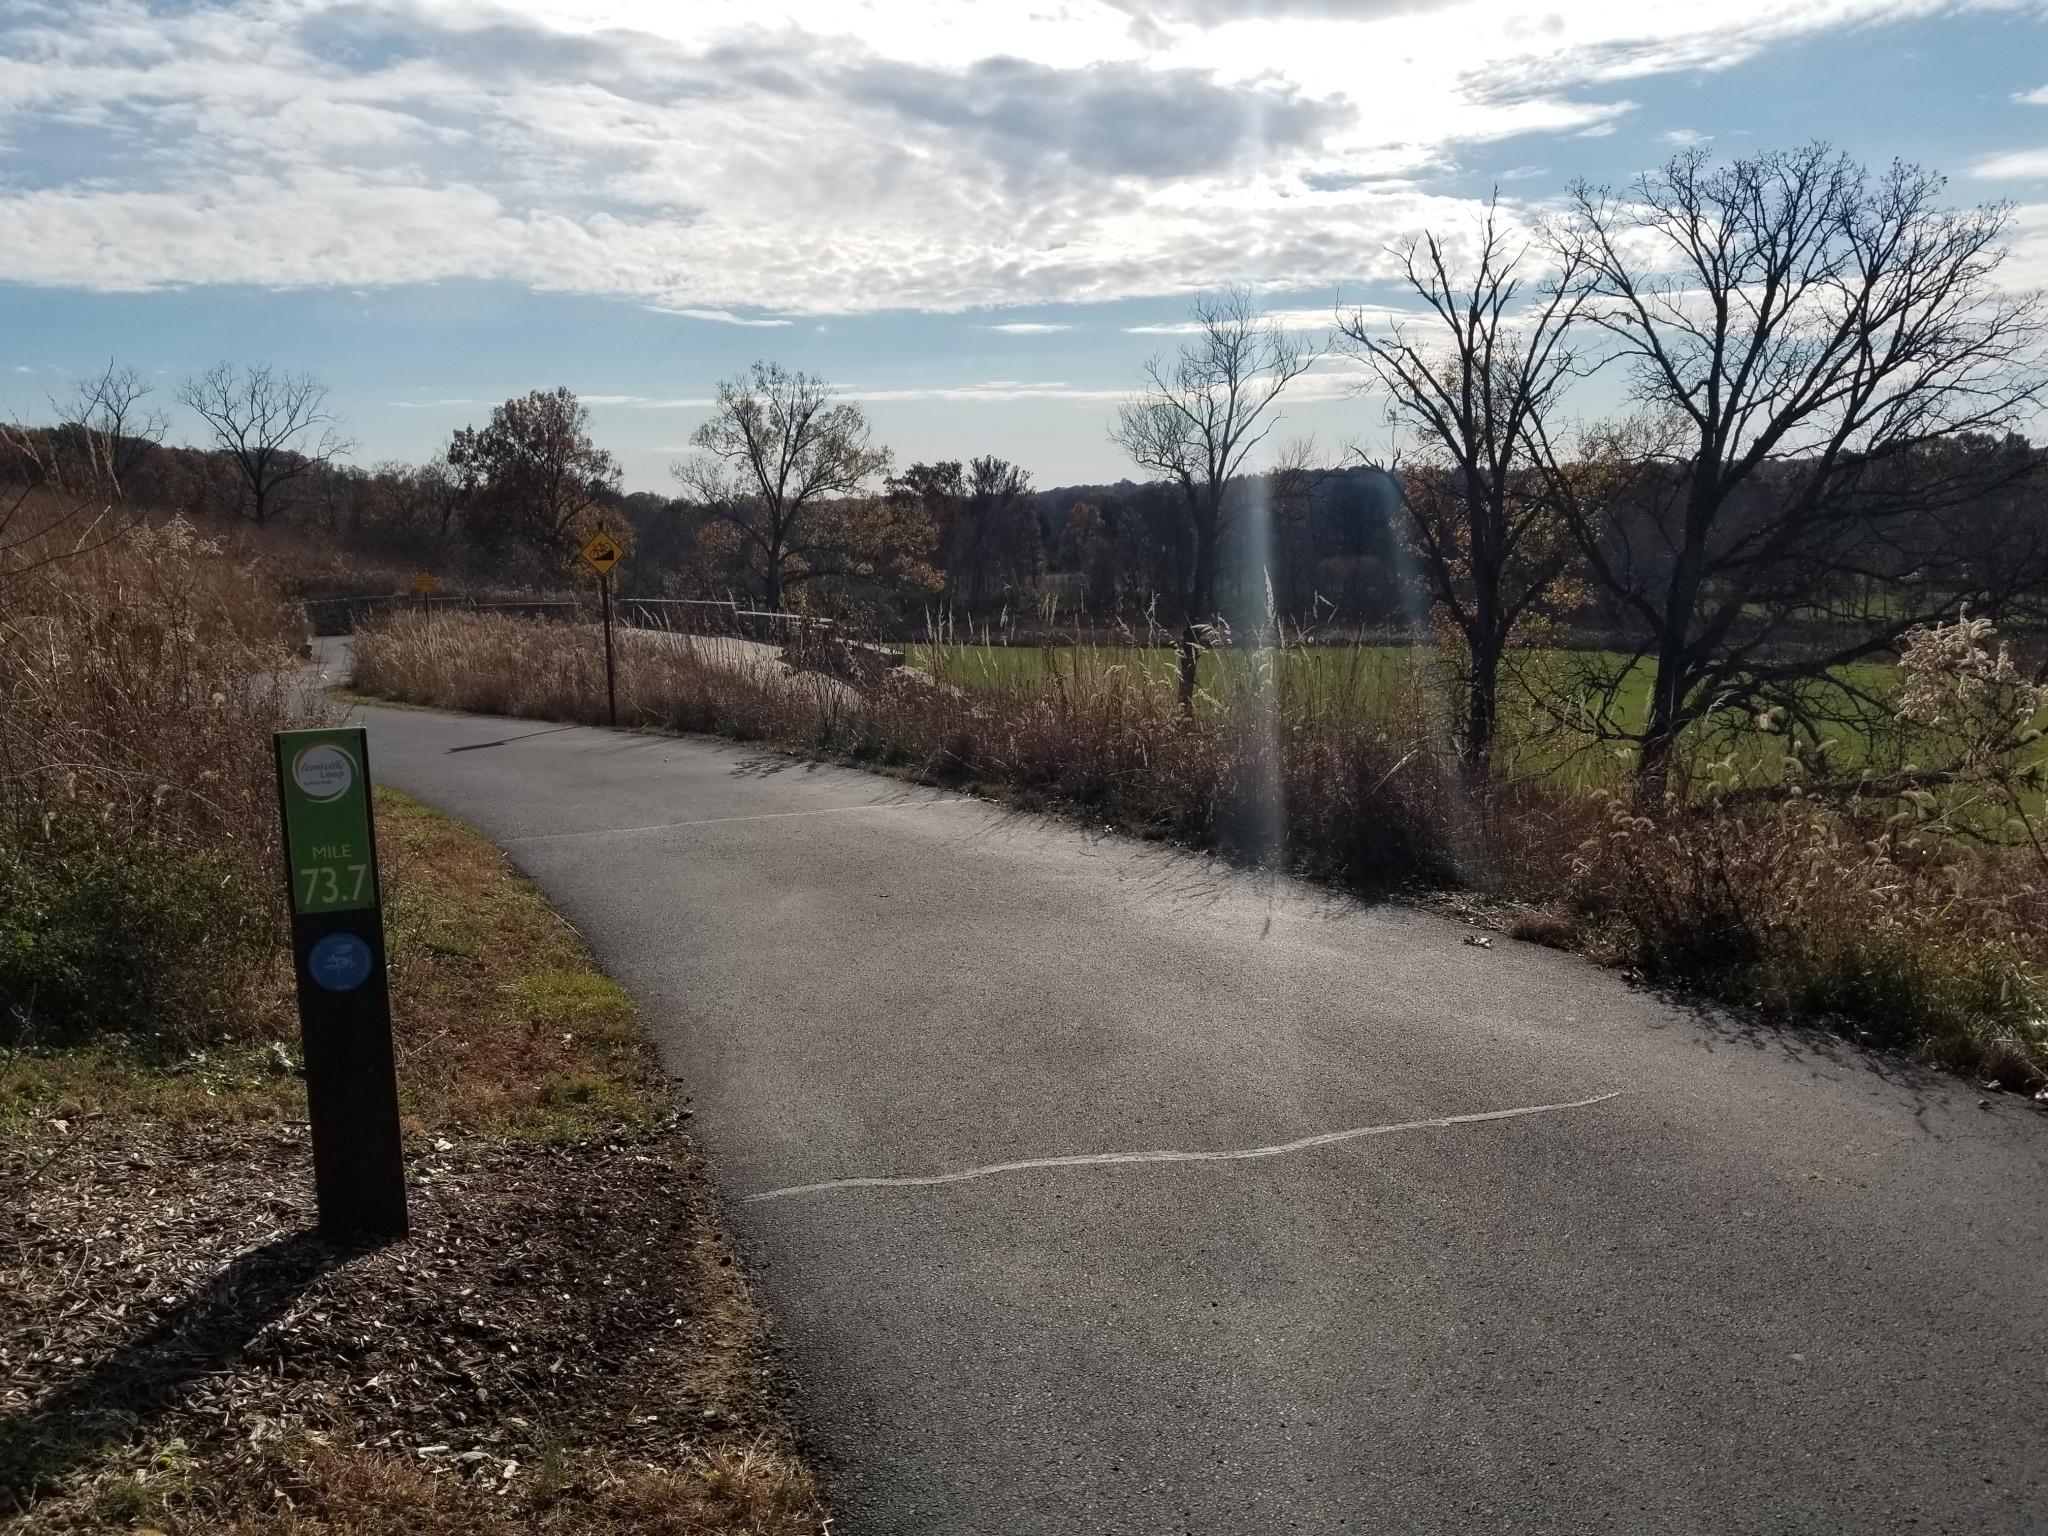 louisville loop parklands mile 73.7